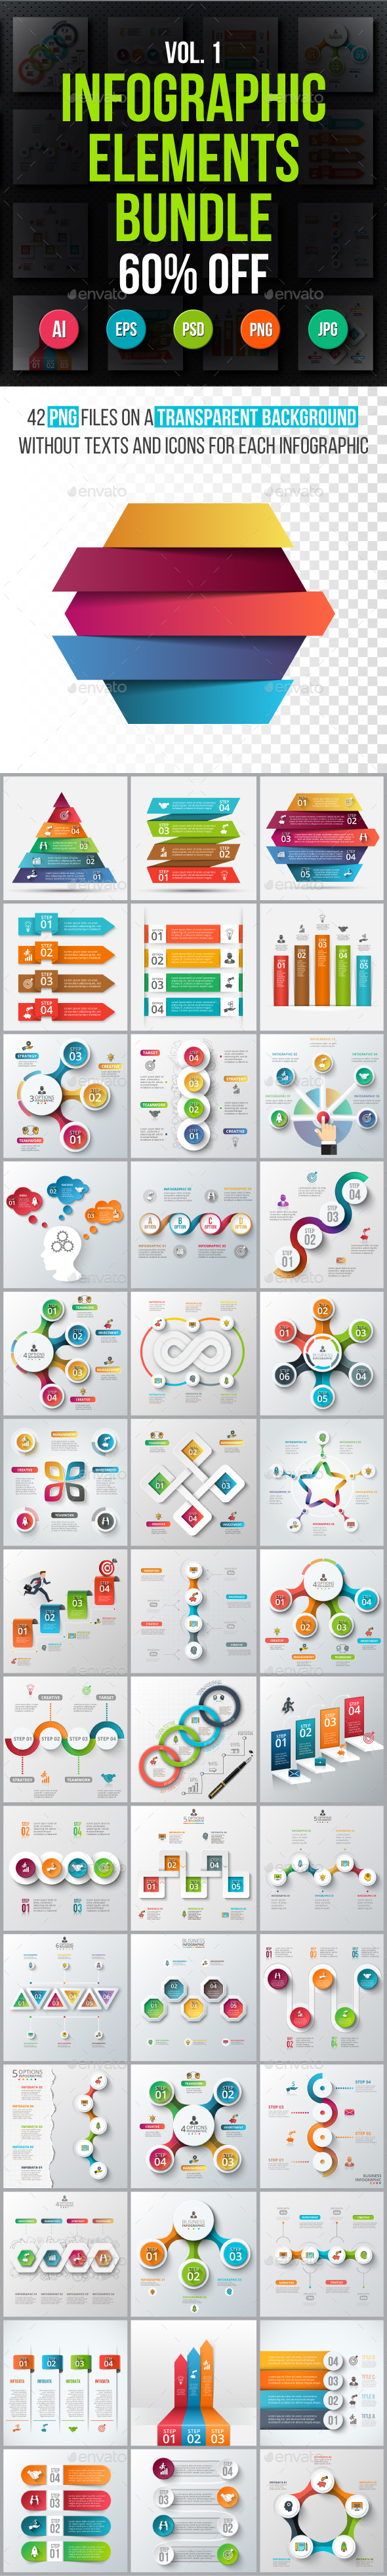 Infographic elements bundle v.01 - Infographics